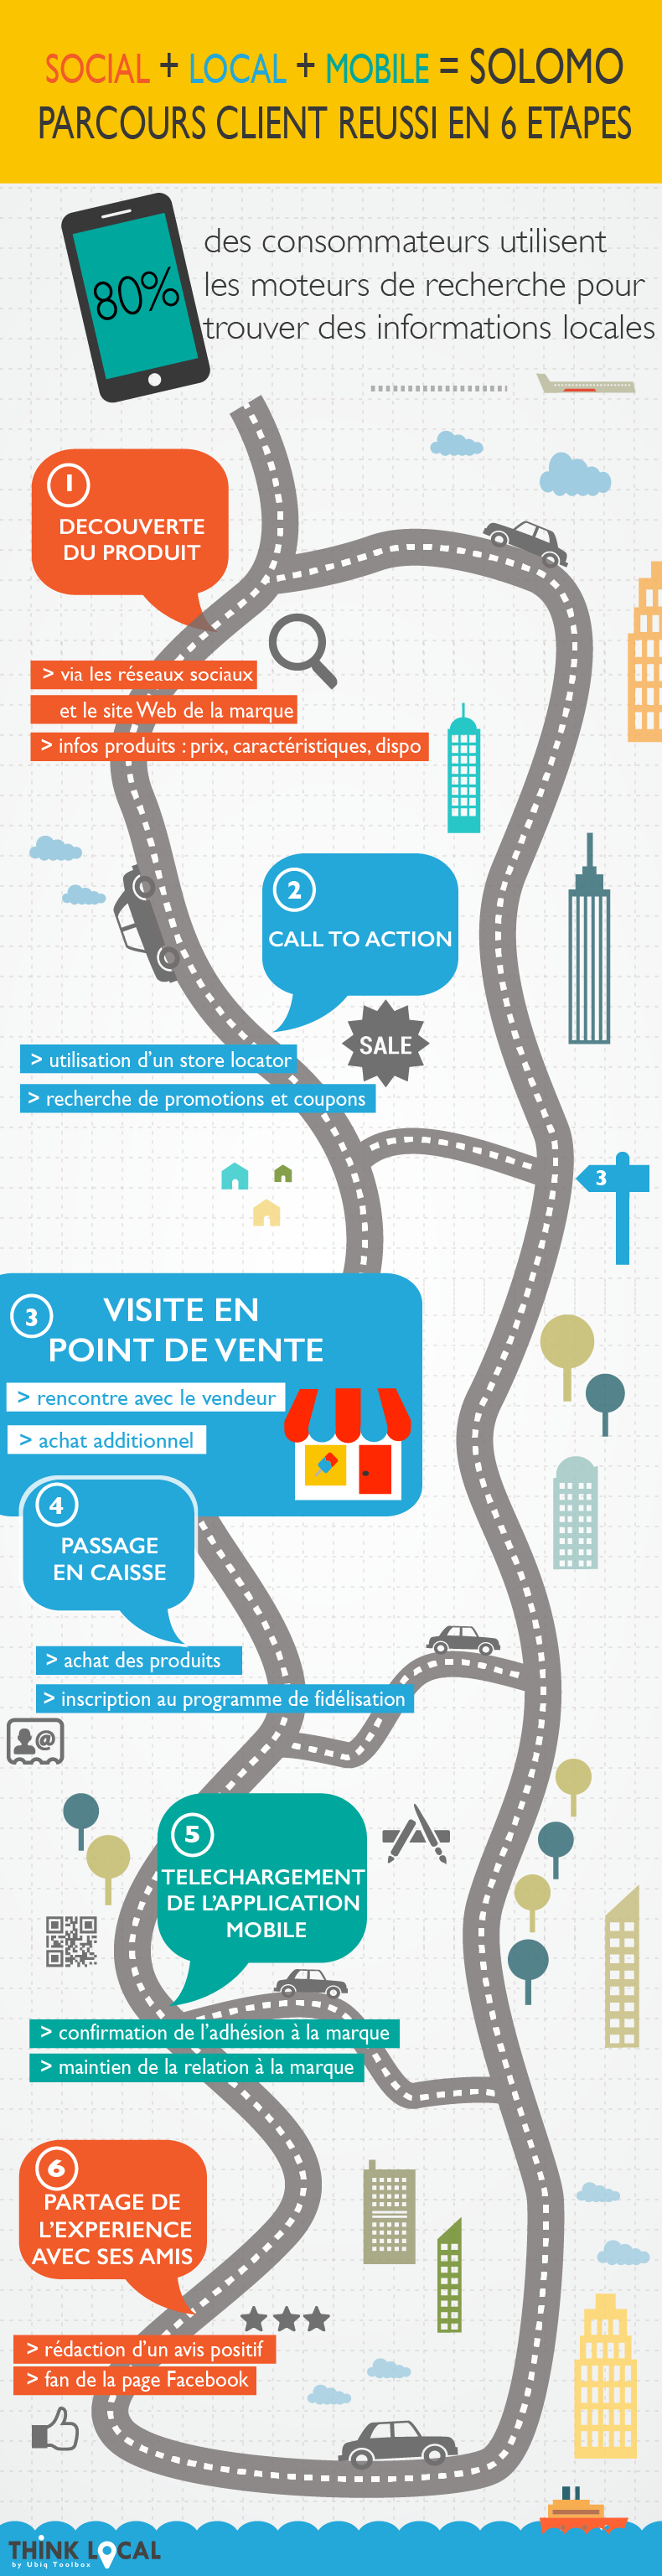 infographie-solomo